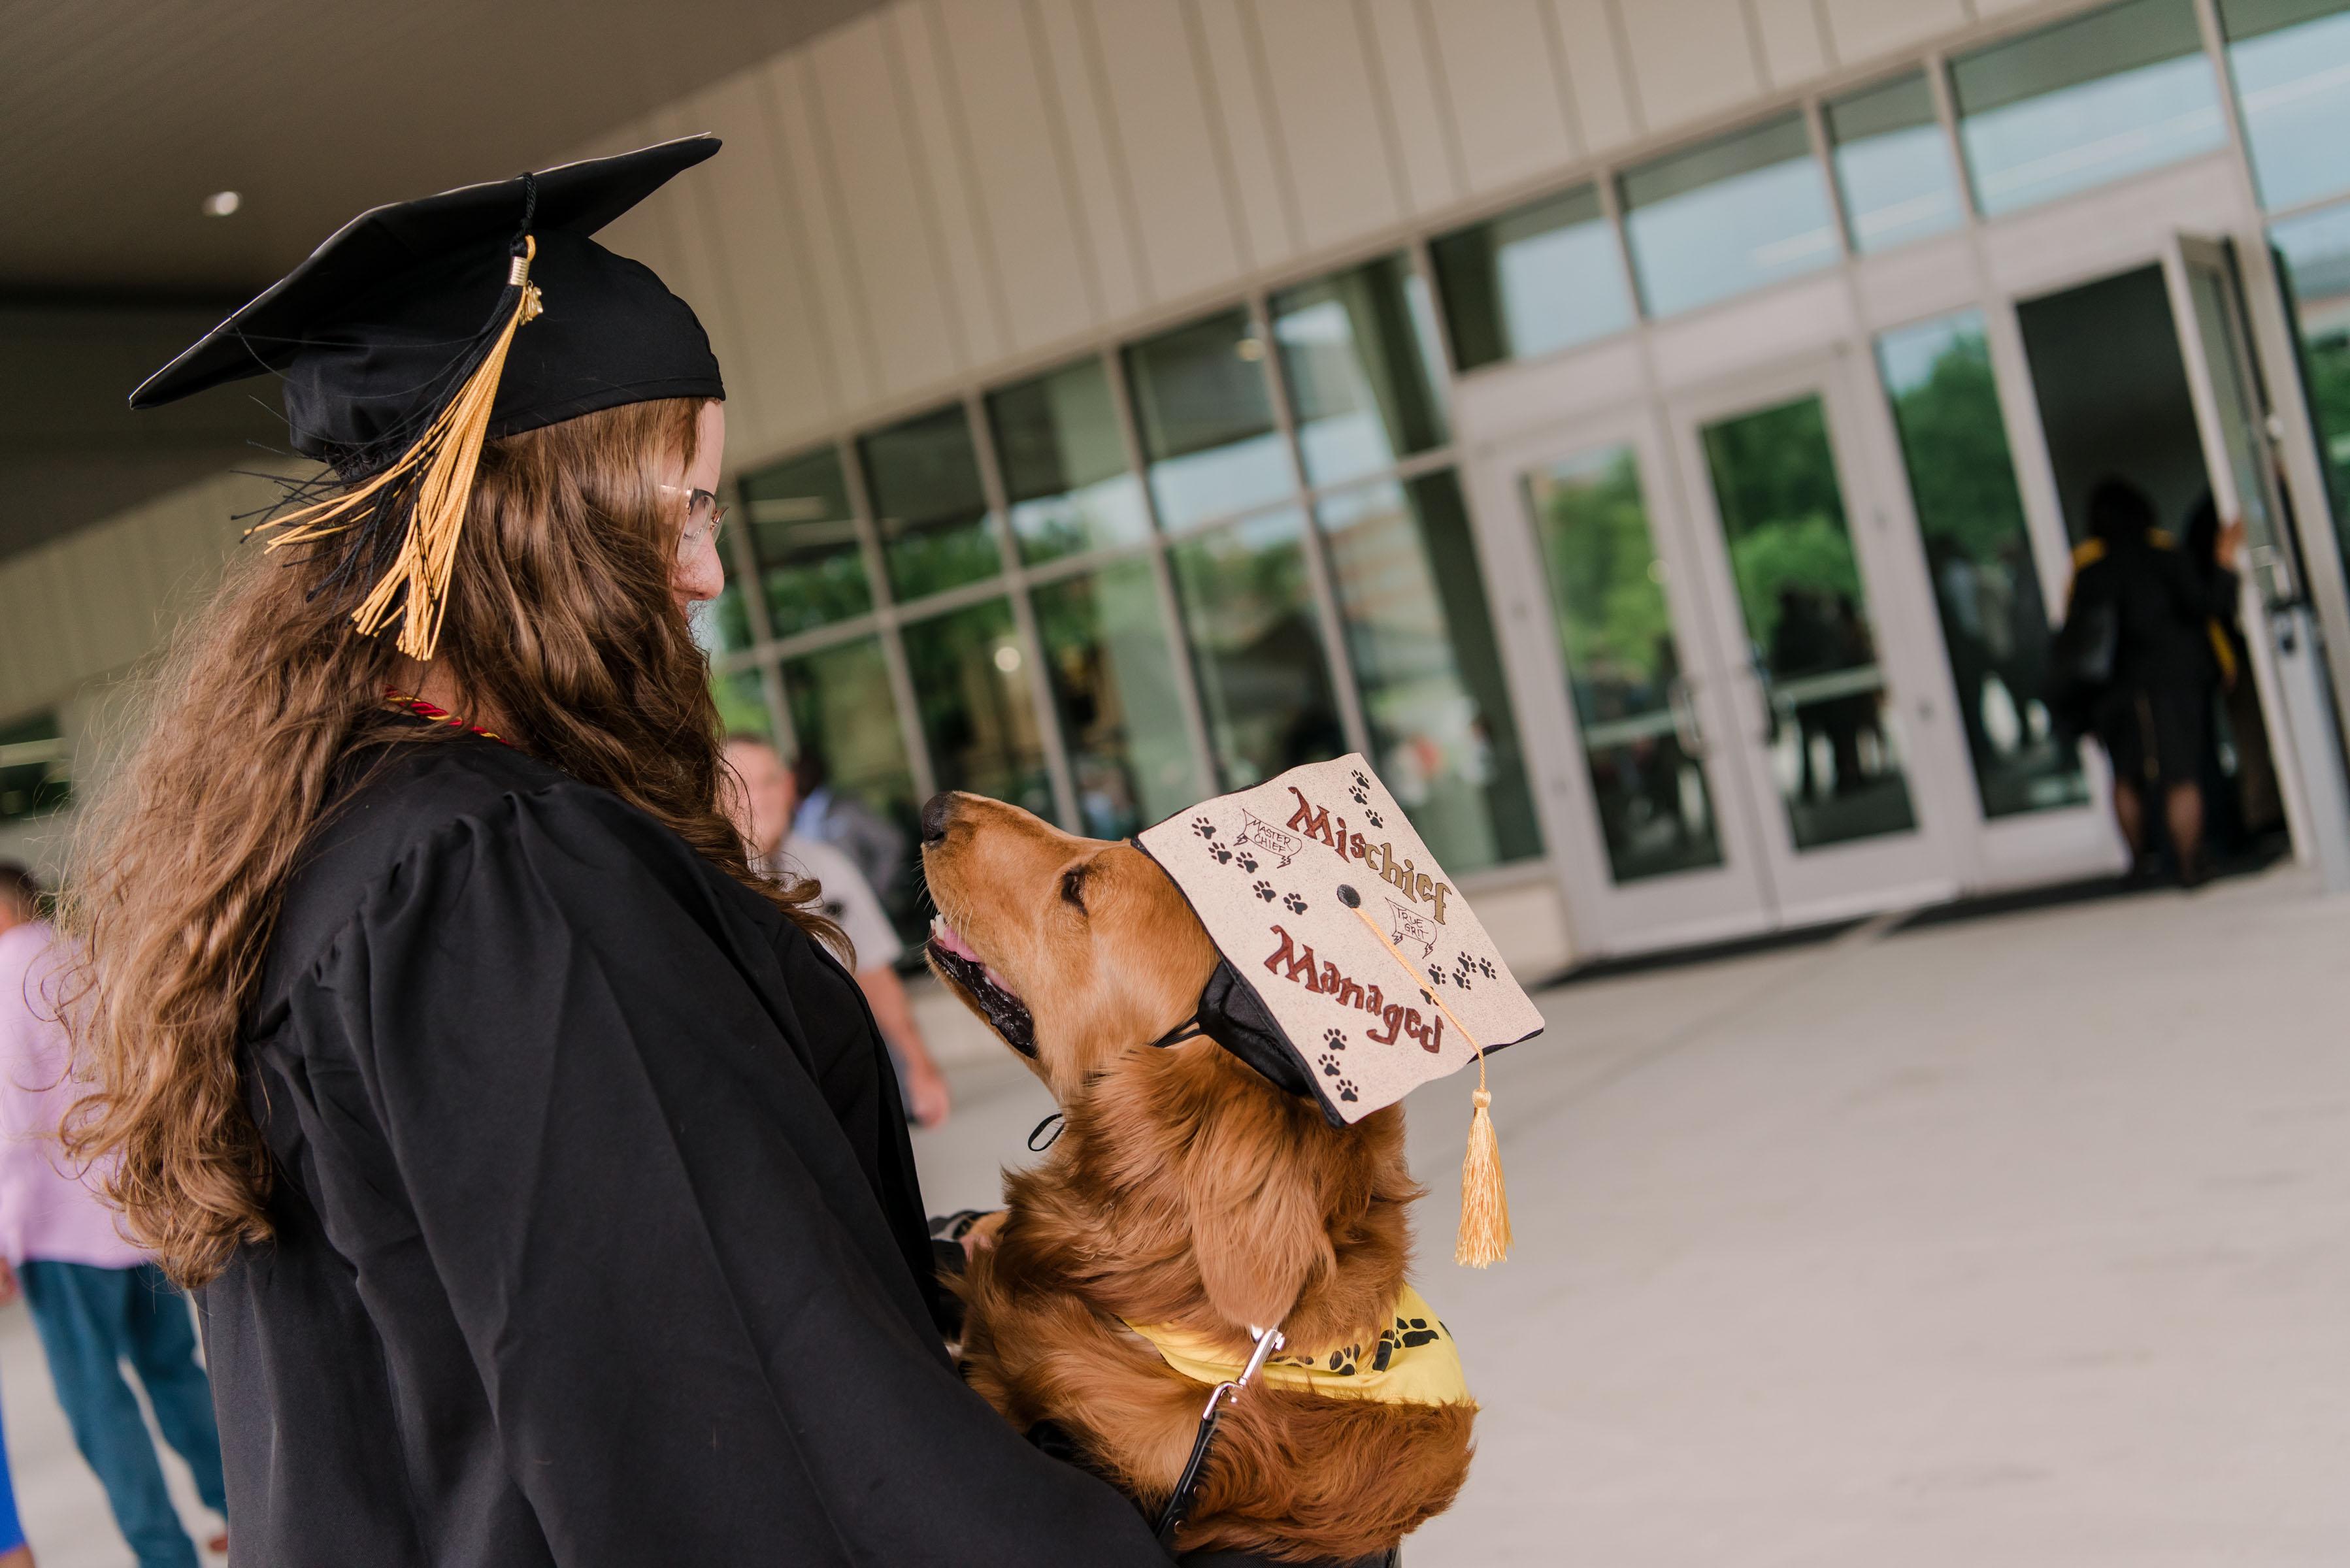 Woman in graduation robes hug dog with graduation cap